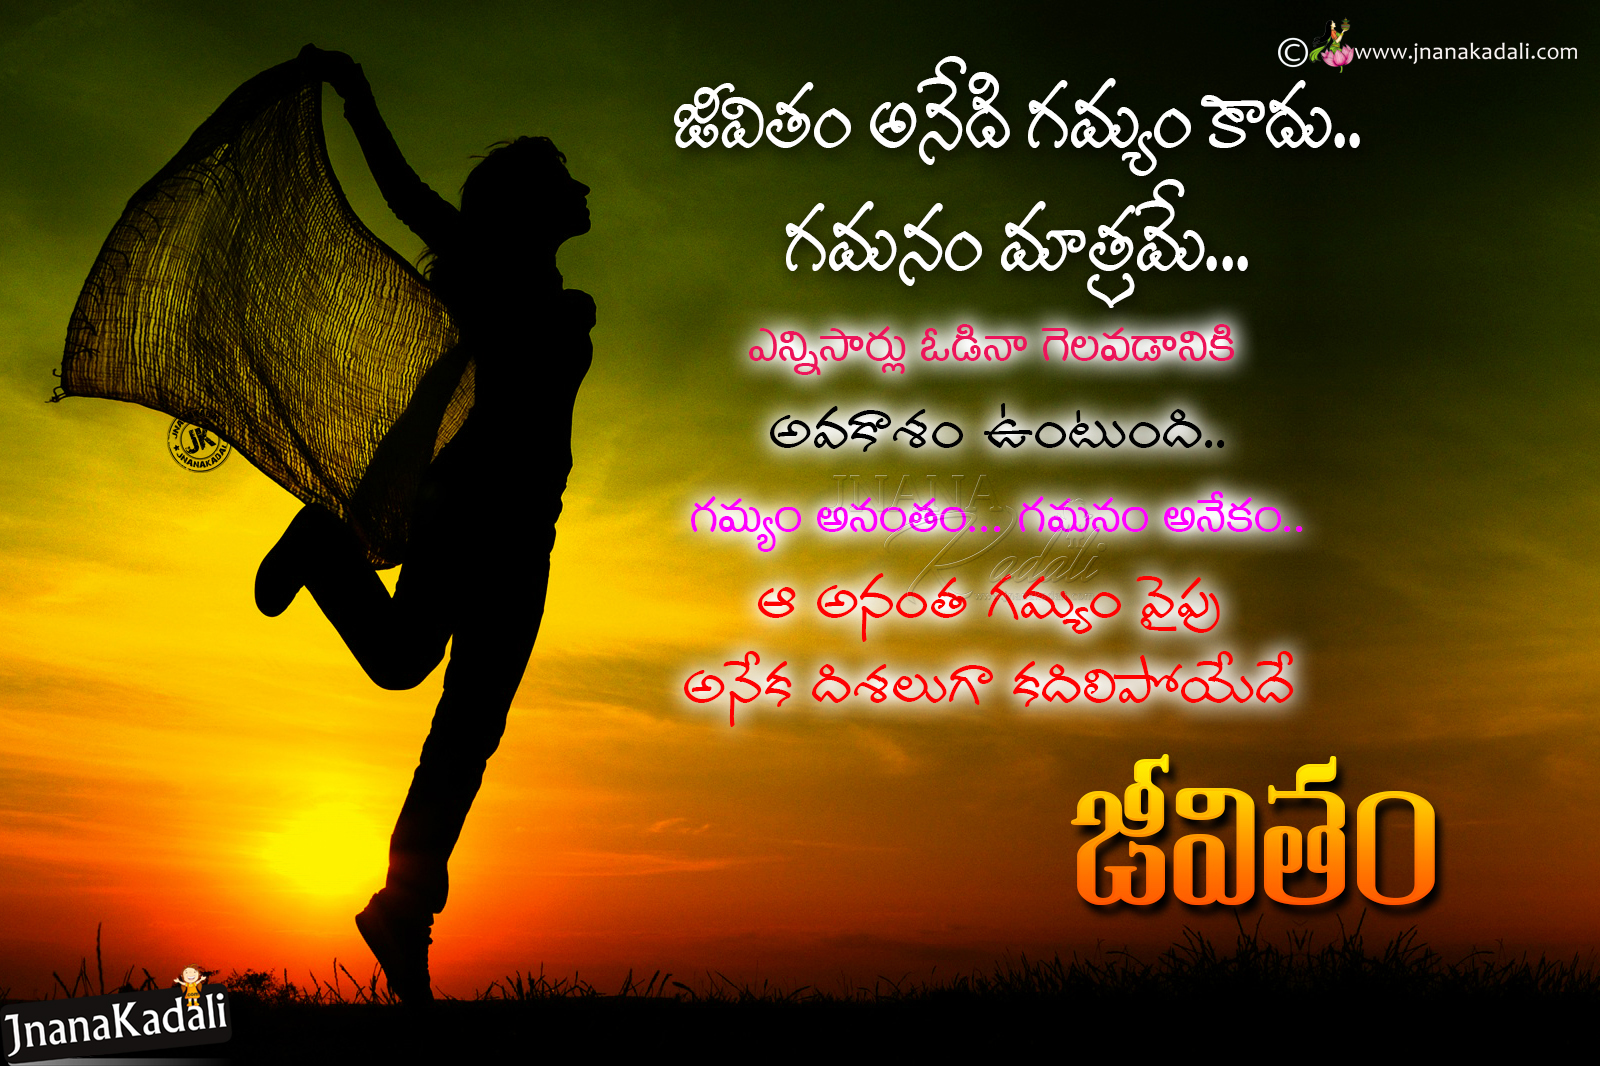 Motivational Life Quotes Best Telugu Inspirational And Motivational Life Quotations With